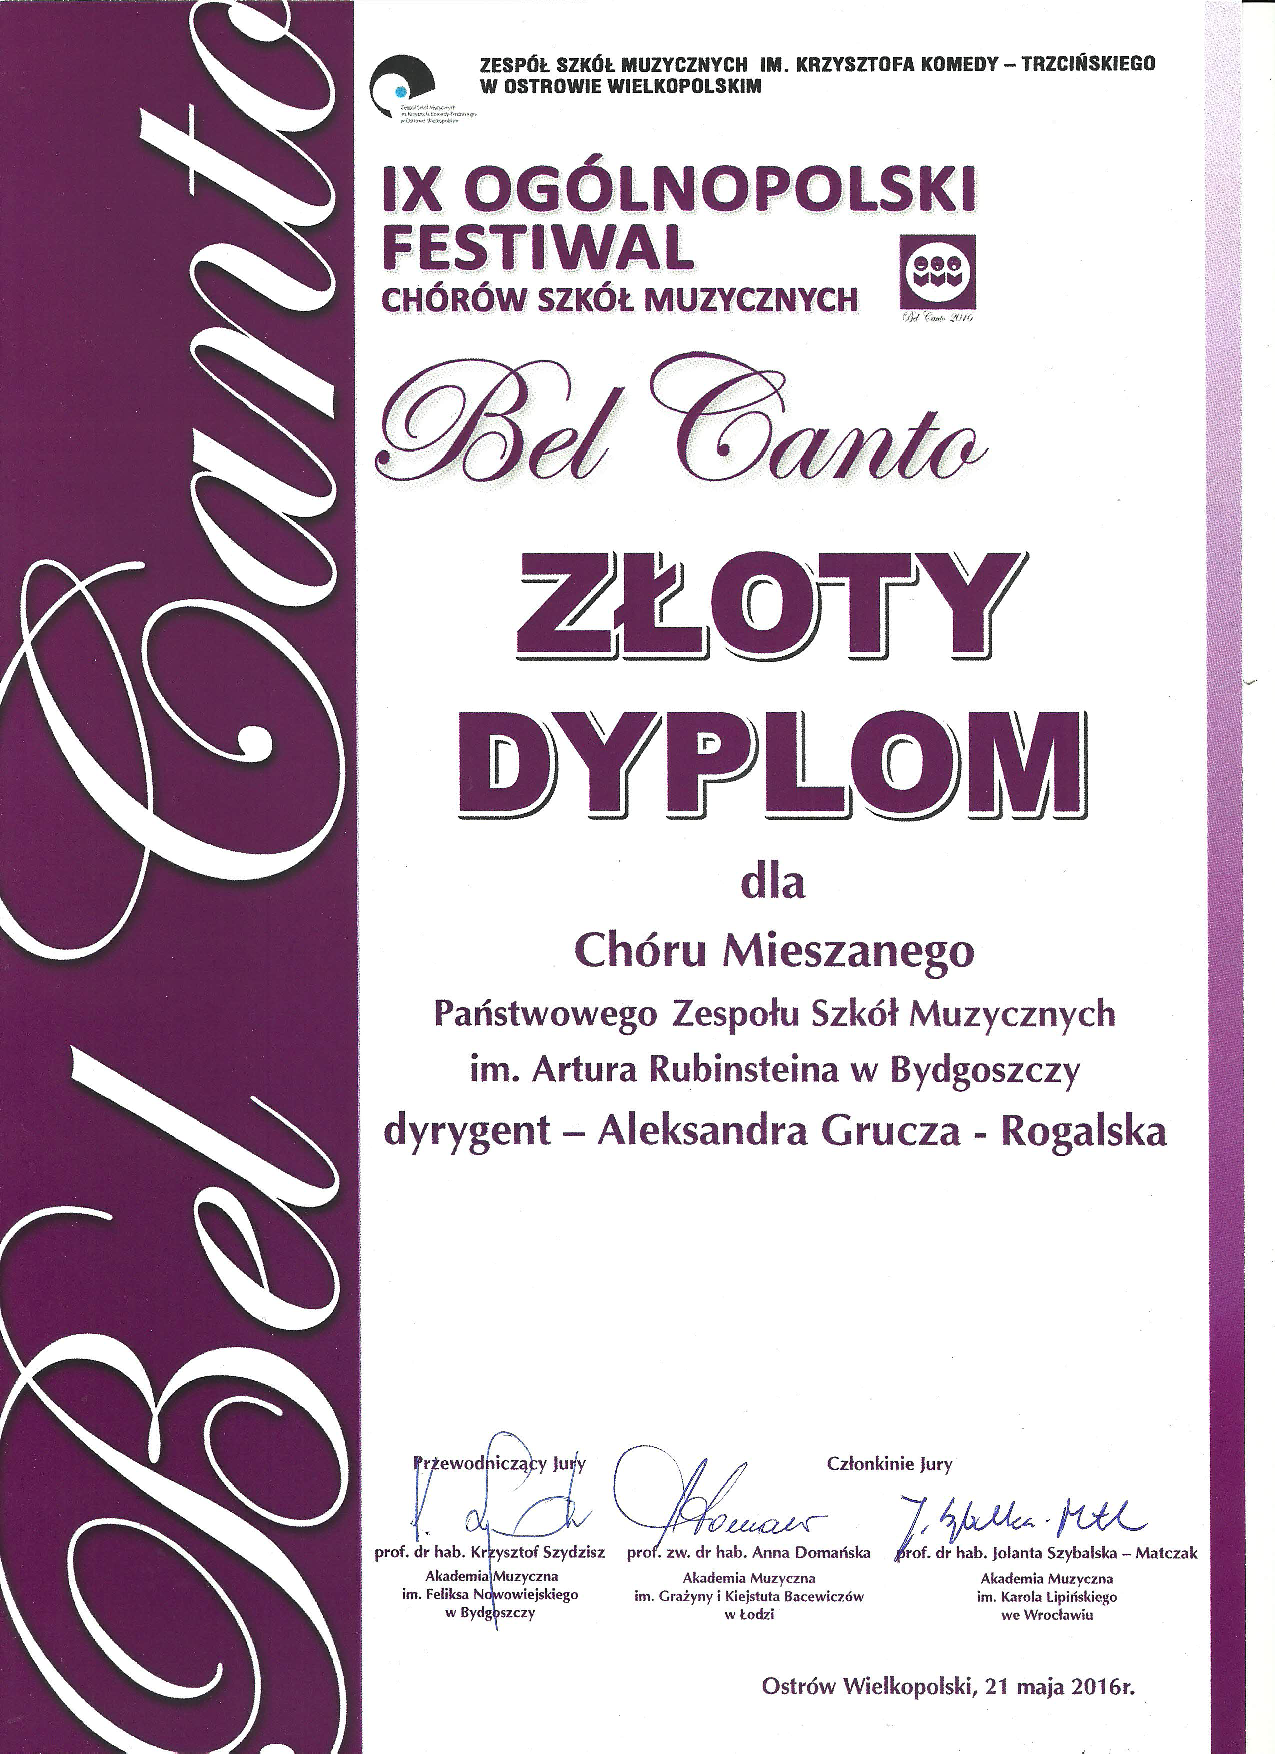 A-Grucza-Rogalska_dyplom_2016